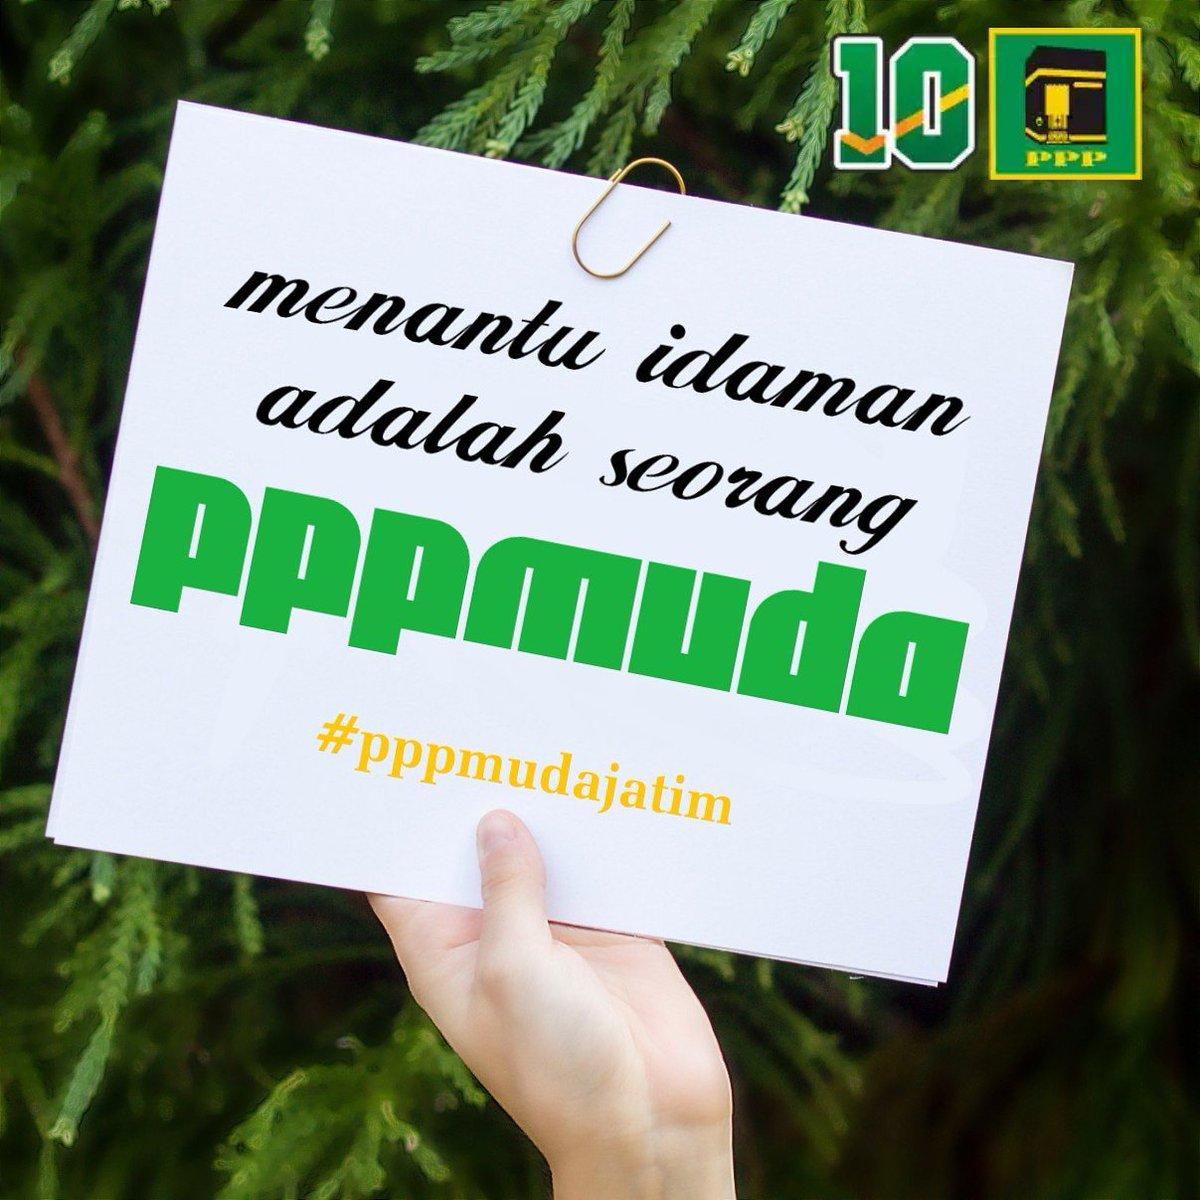 Bergeraklah mblo  #bergerakbersamarakyat  #ppp46th  #pppmuda #pppmudajatim #pppmudaindonesia #pppmudajokowi #pppmudakabpas #pemudaidaman #PPP  @DPP_PPP  @pppjatim_dpw  @MRomahurmuziy